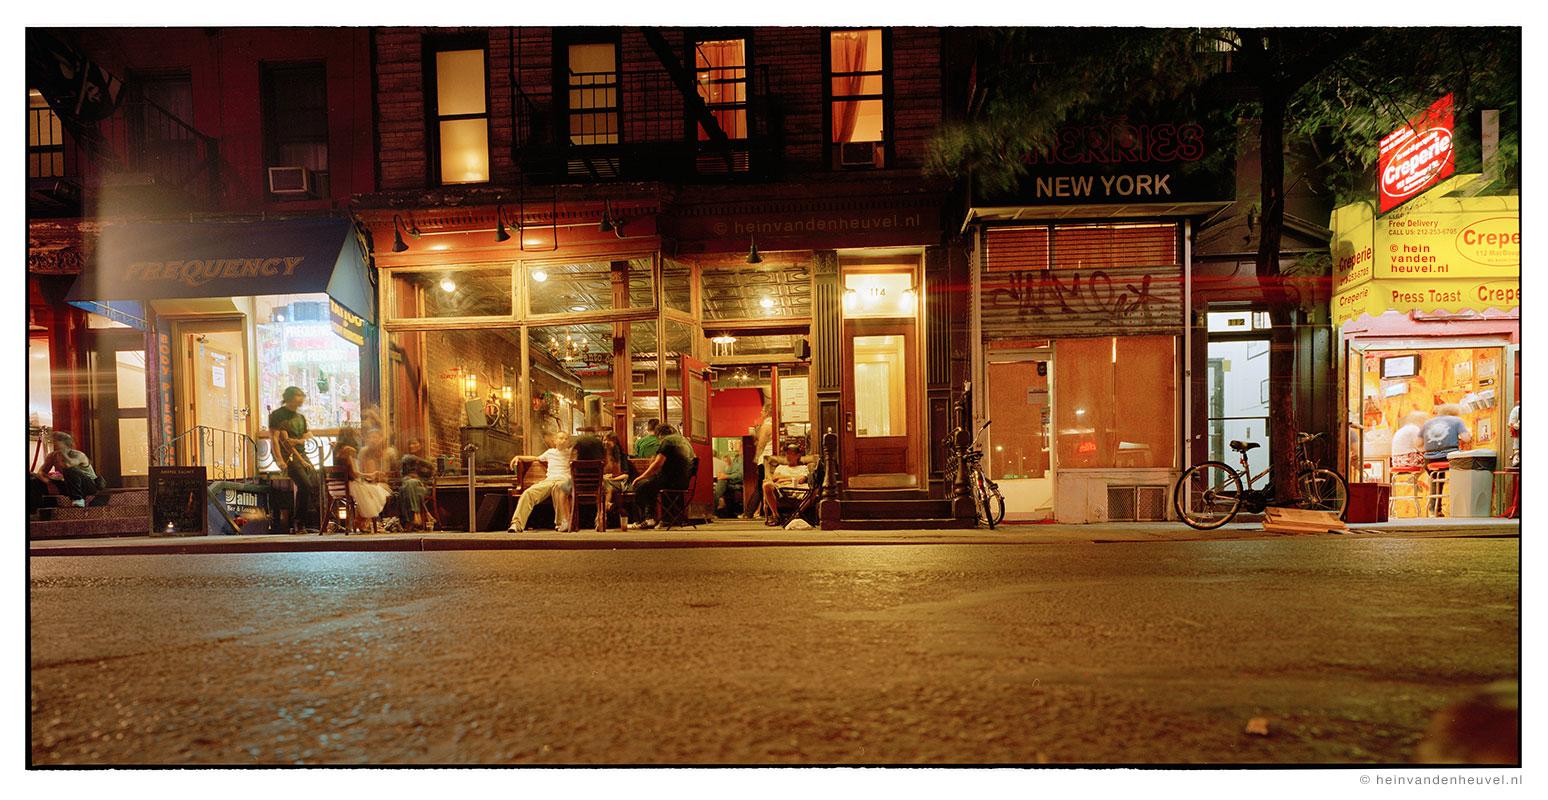 professioneelfotograaf-avondfoto-newyork-splitsecond-.jpg